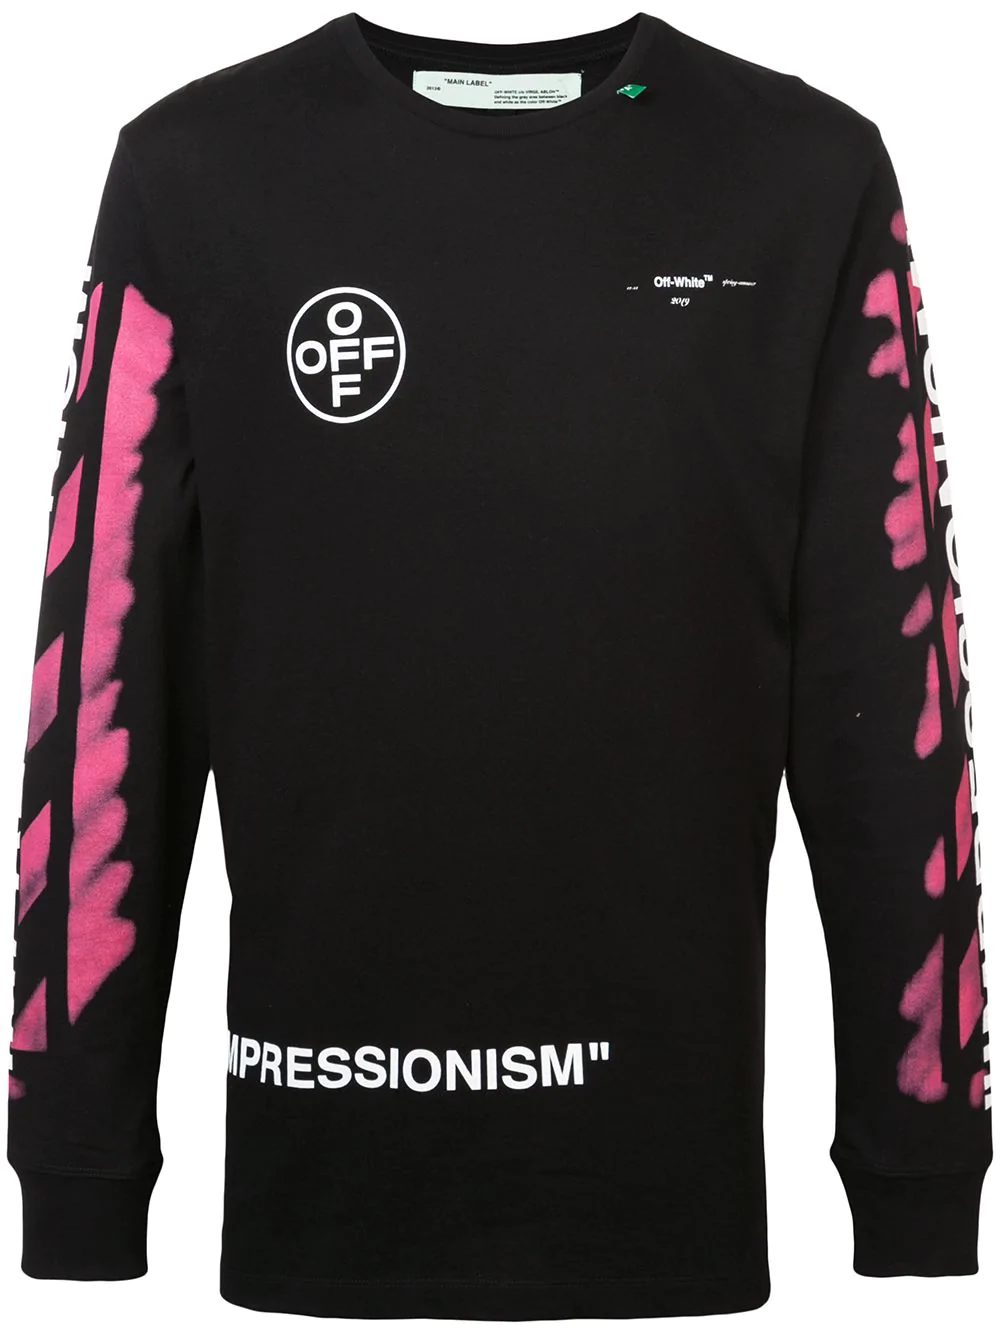 b860b9e92272e6 Off-White Impressionism' Diag Stencil Sweatshirt Black/Pink/White ...